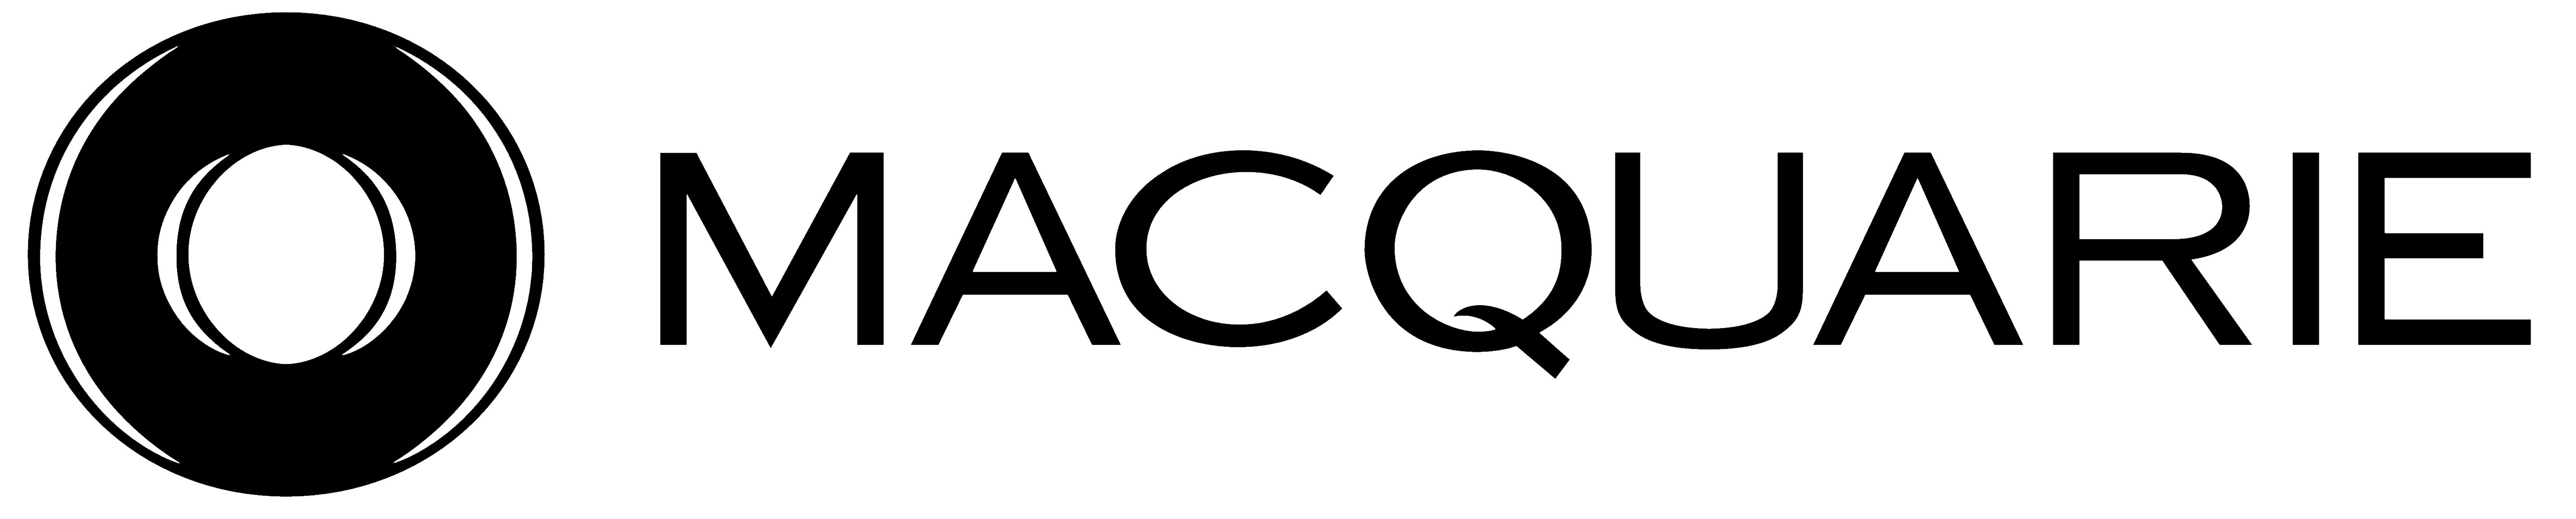 Macquarie capital investment management australia tata forex gurgaon